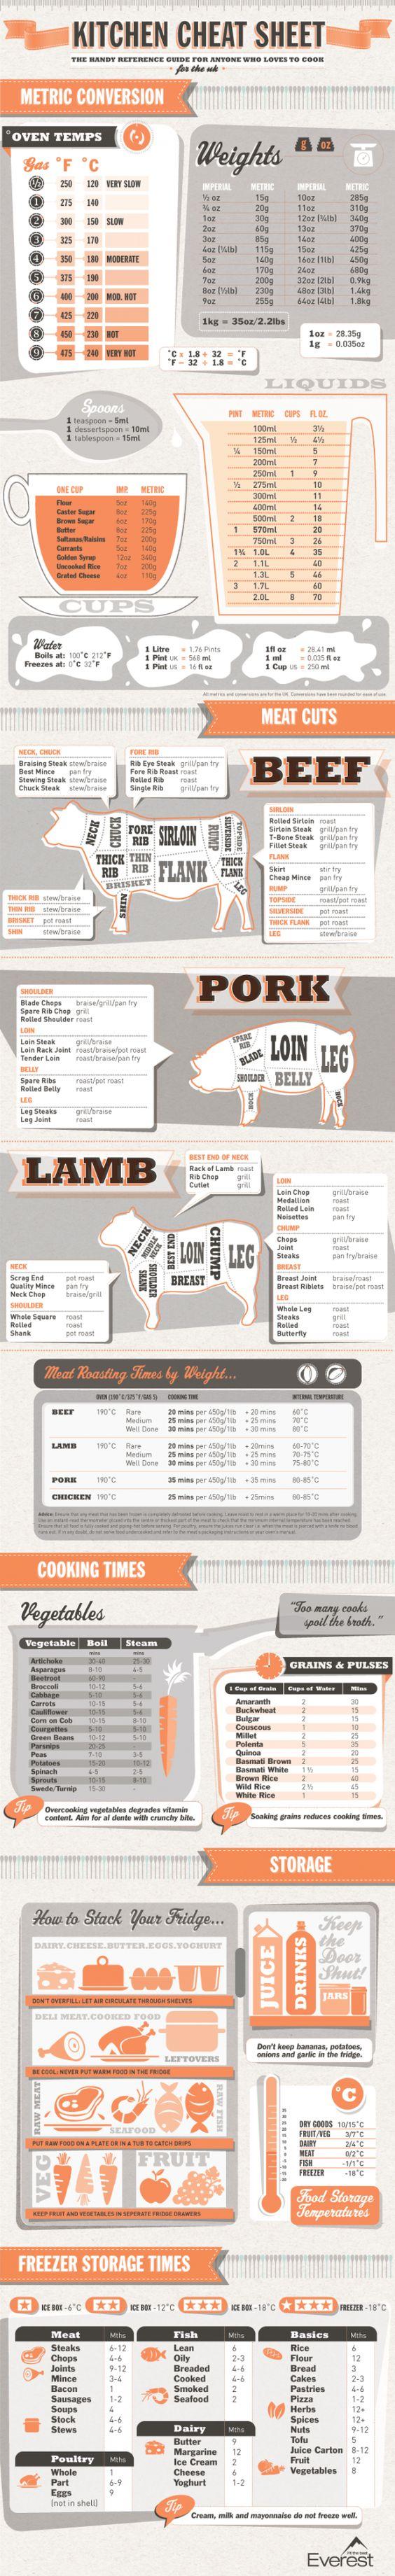 Kitchen Cheat Sheet Infographic